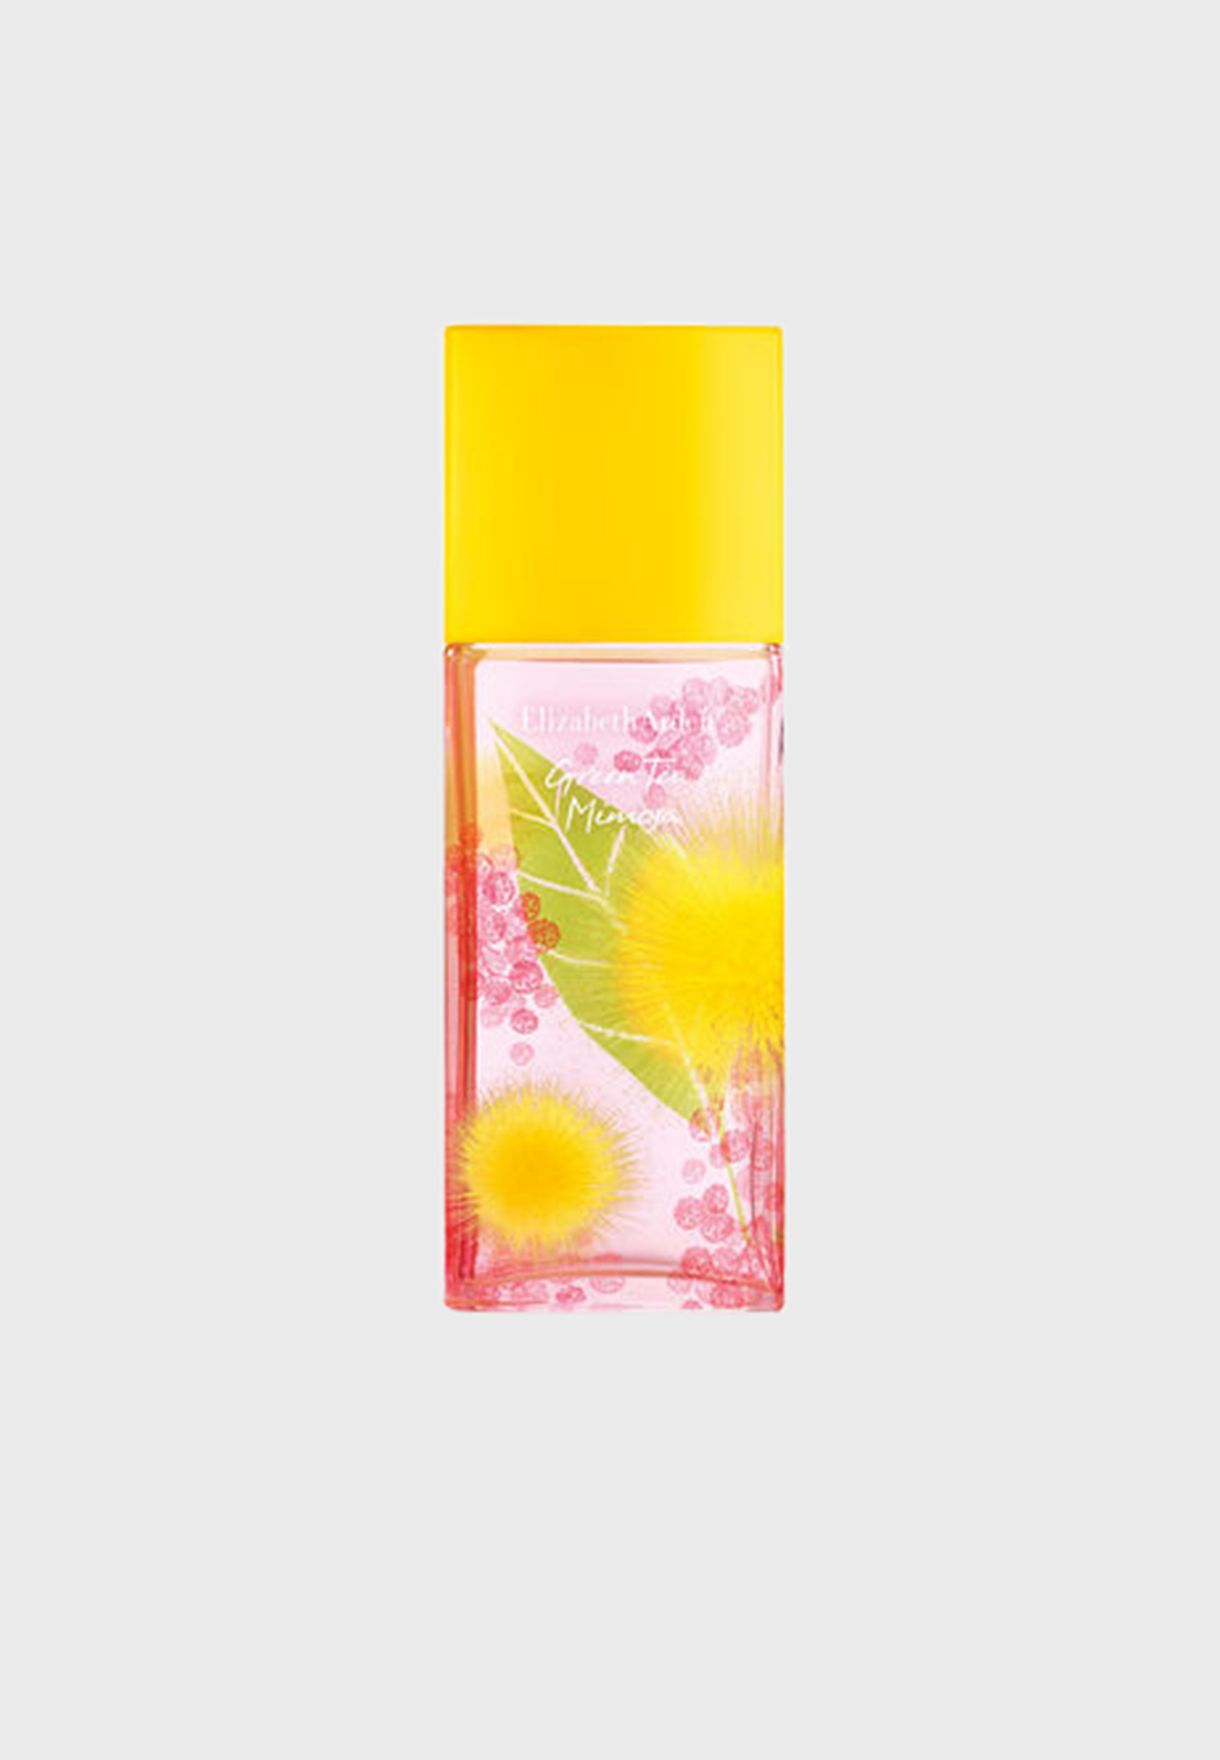 Green Tea Mimosa Eau de Toilette 100ml